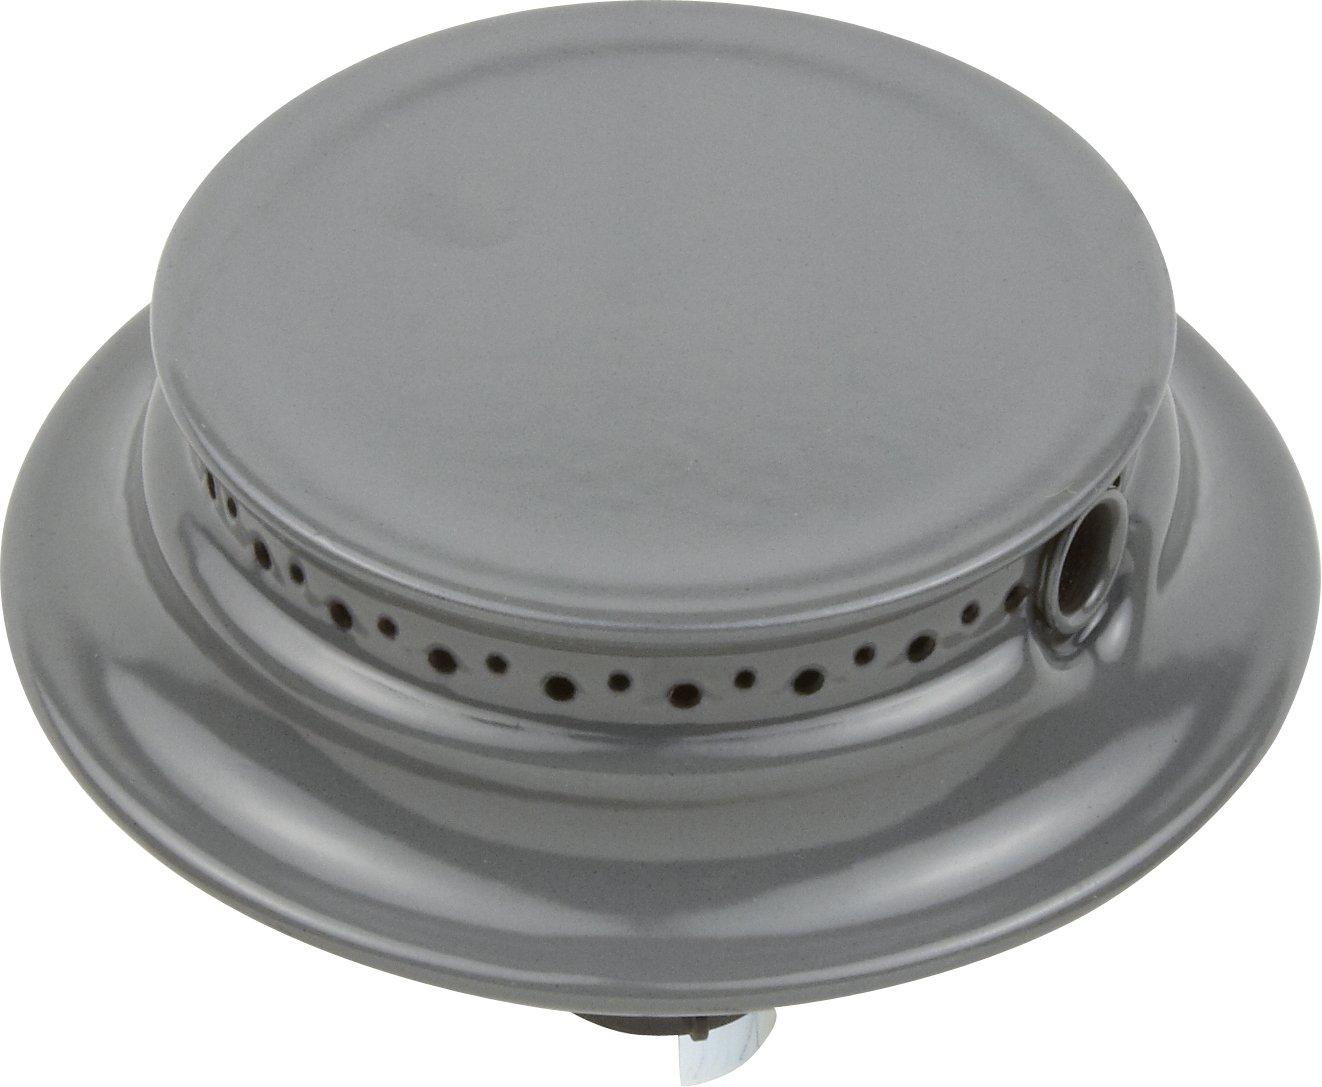 Whirlpool 3412D024-26 Sealed Burner